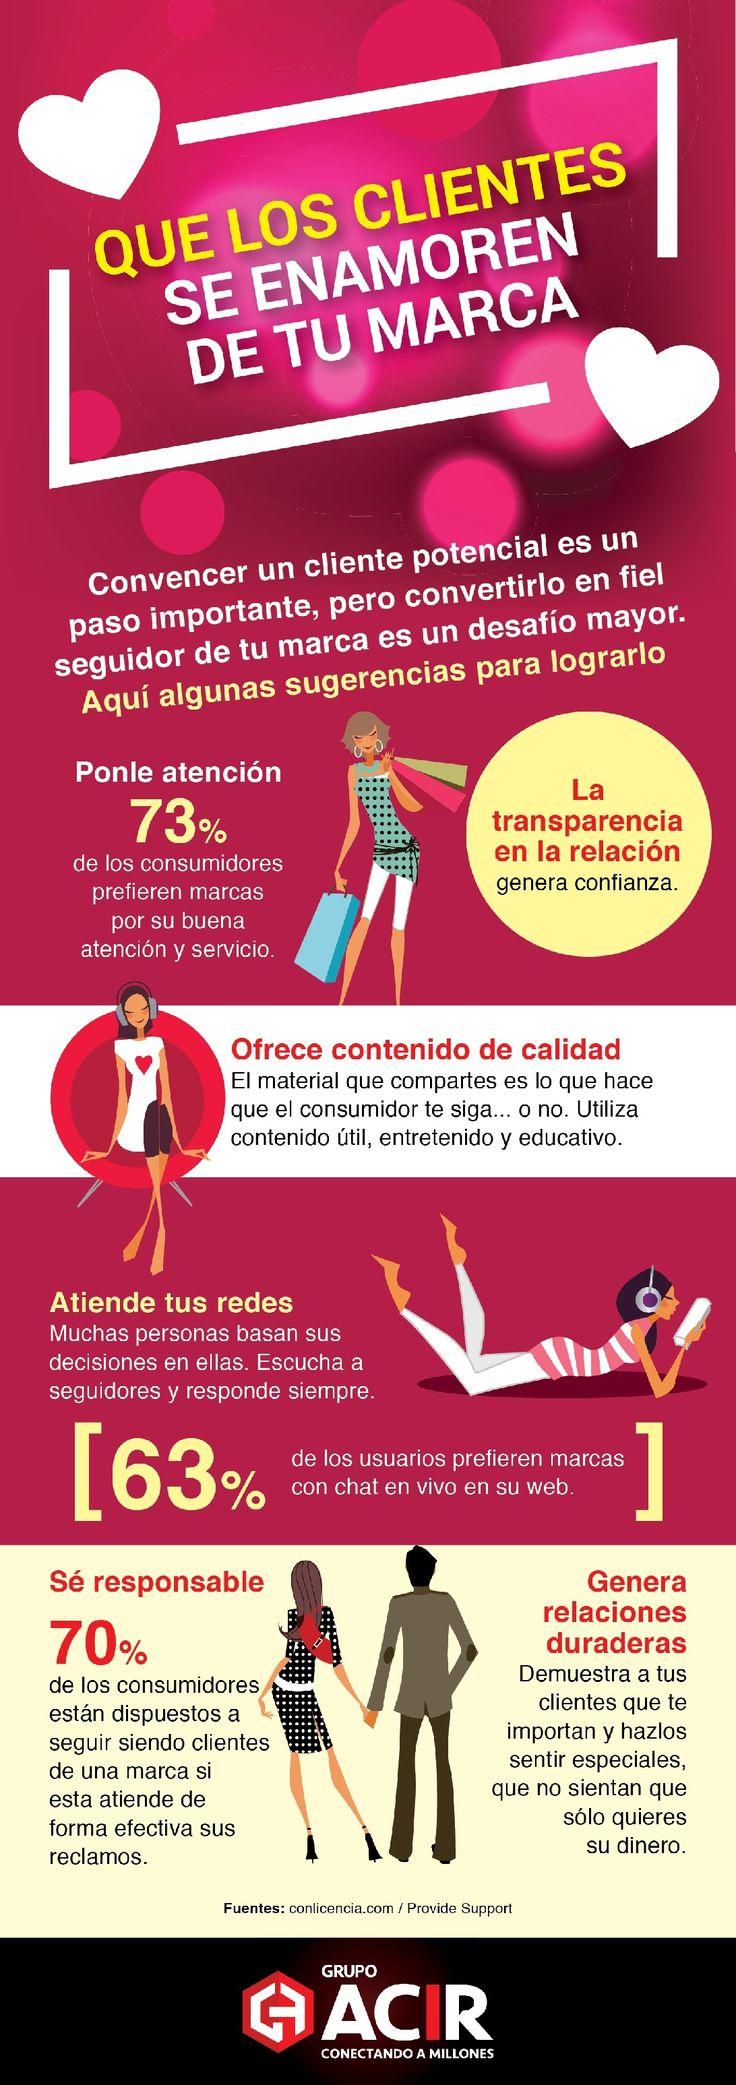 Cómo mantener a tus clientes enamorados de tu marca #infografia #infographic #marketing